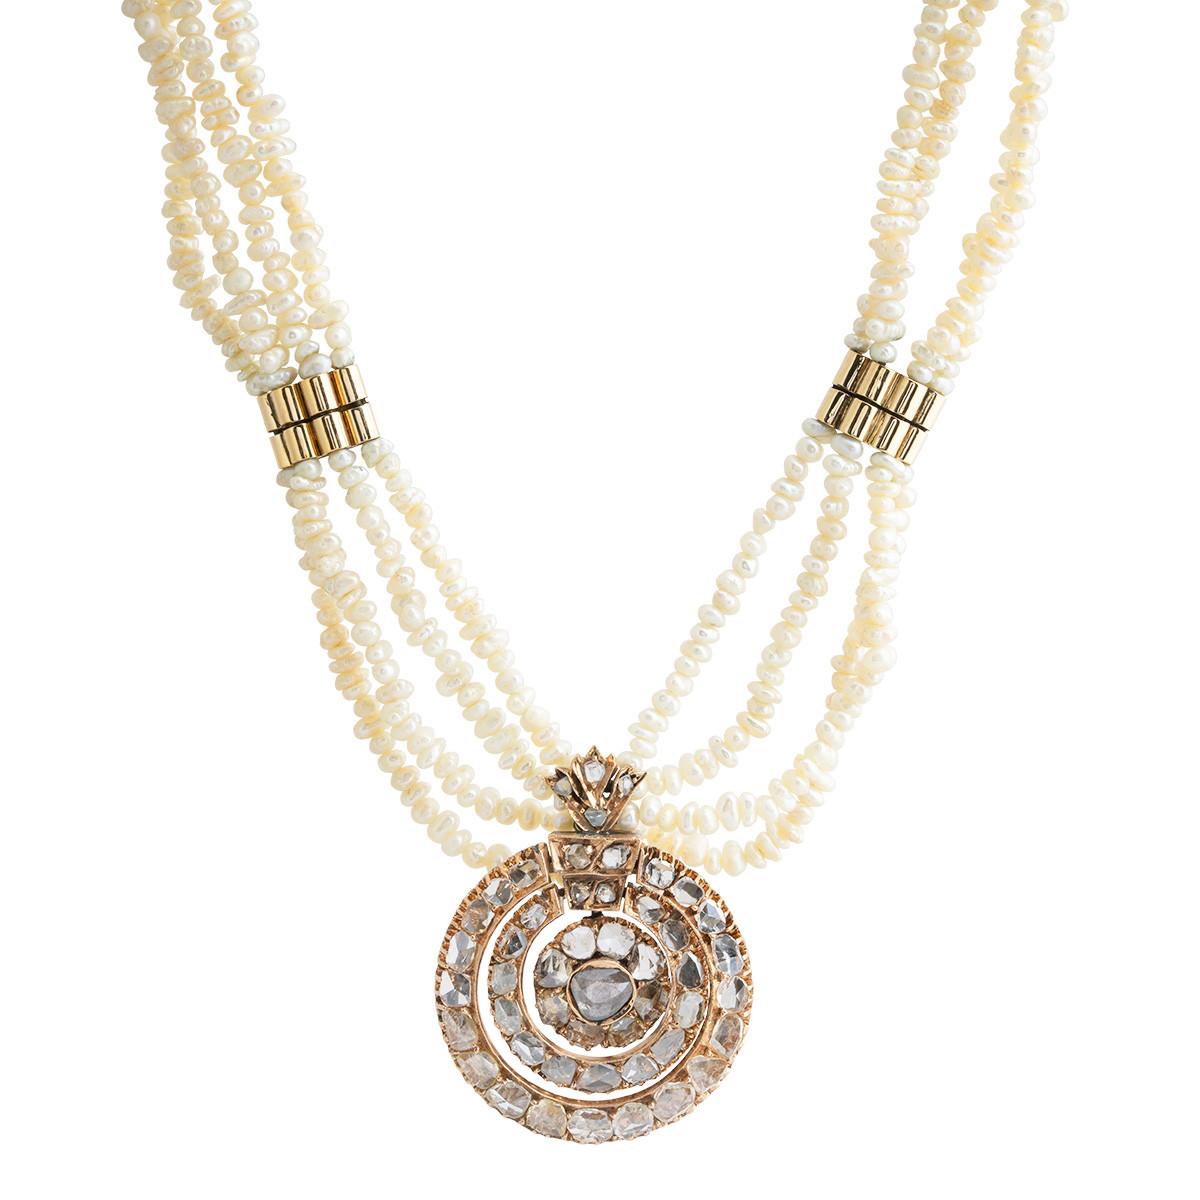 Antique 2.50 CTW Diamond & Pearl Necklace